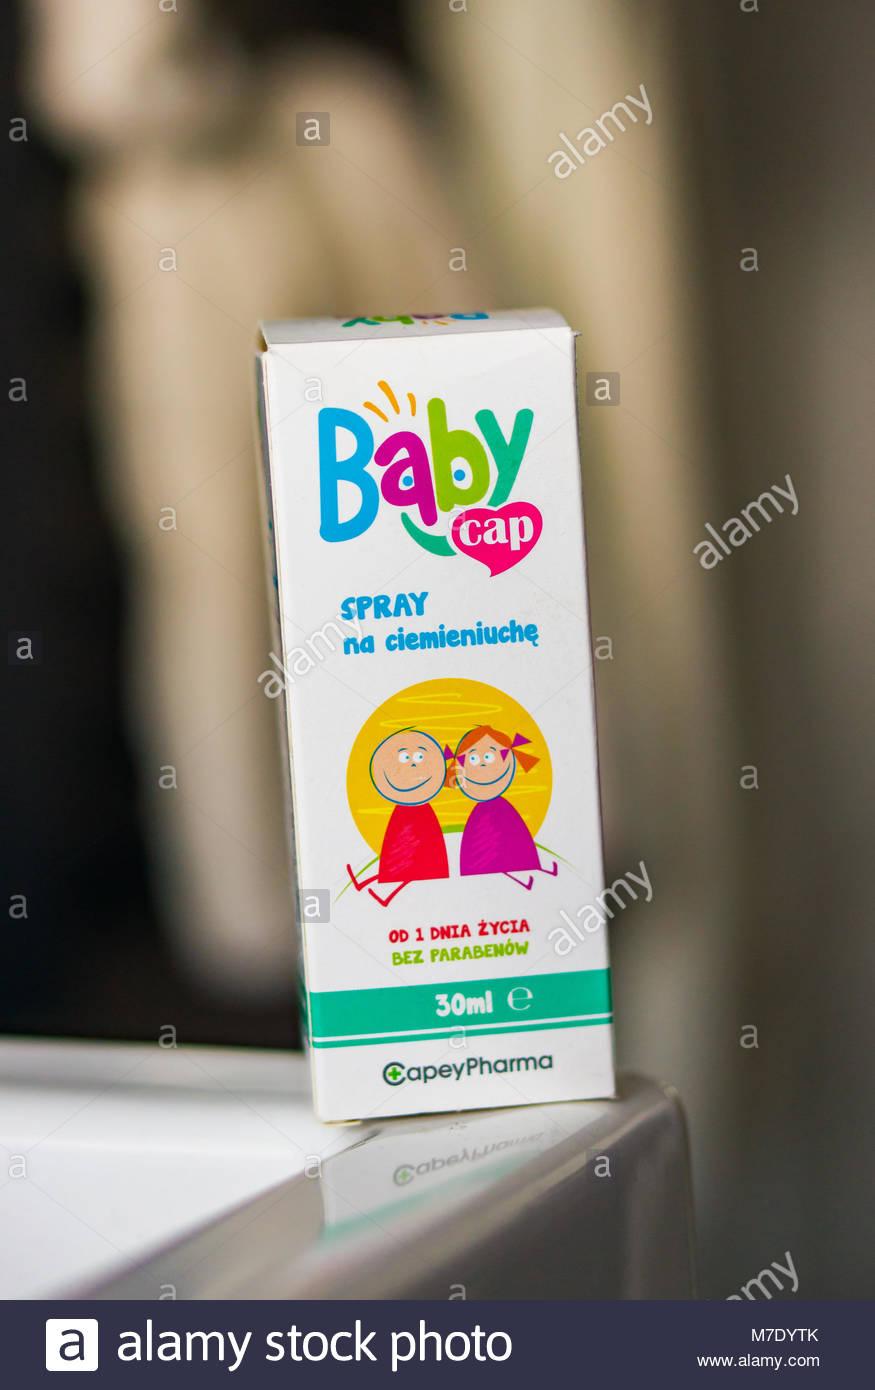 Poznan, Poland - March 03, 2018: Baby Cap spray medicine for cradle cap in a box - Stock Image